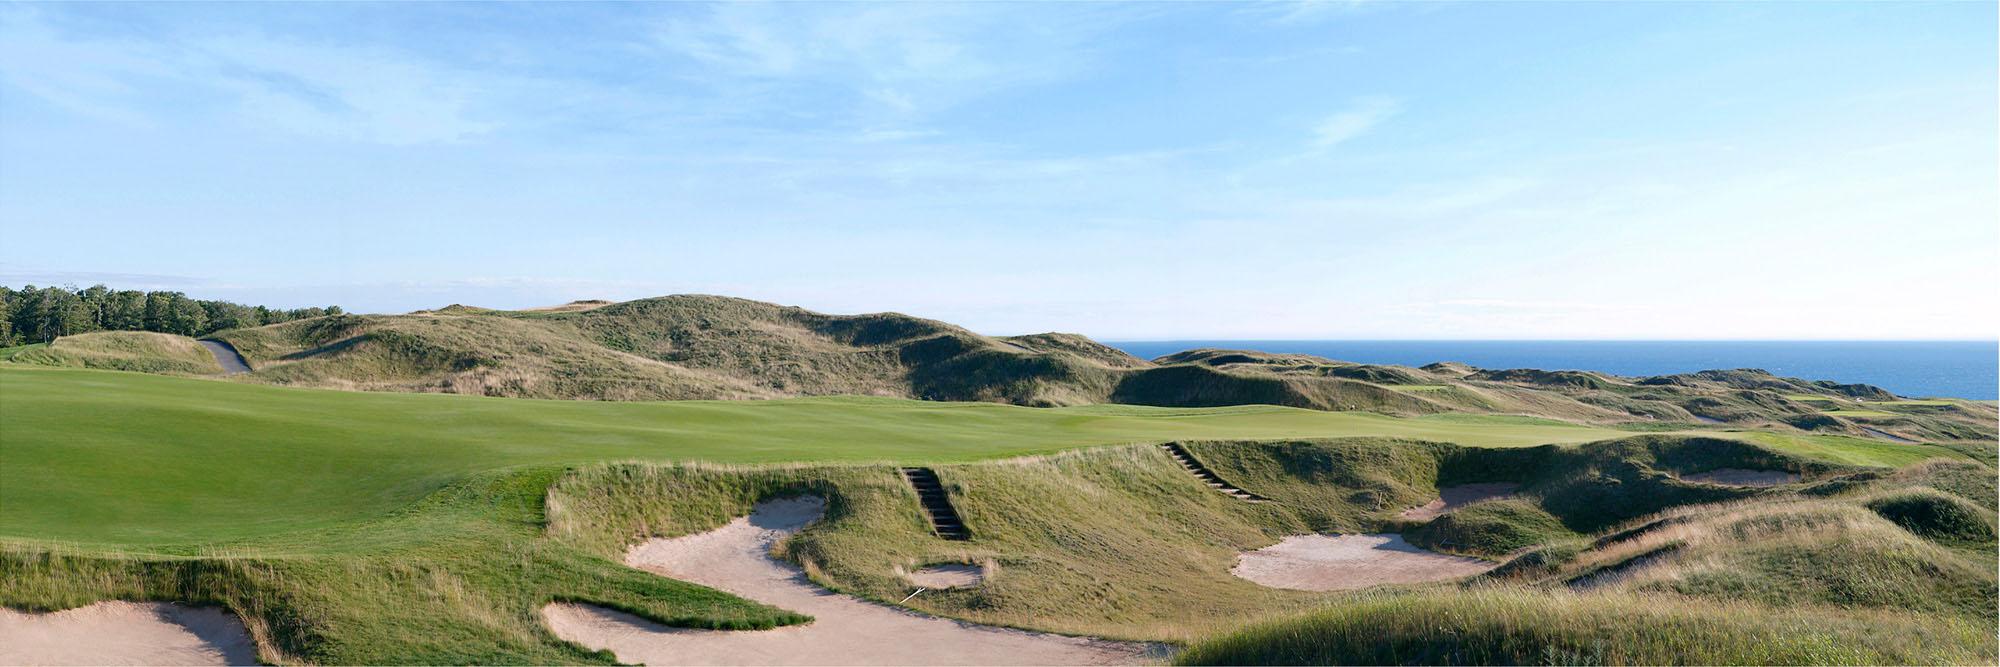 Golf Course Image - Arcadia Bluffs No. 16